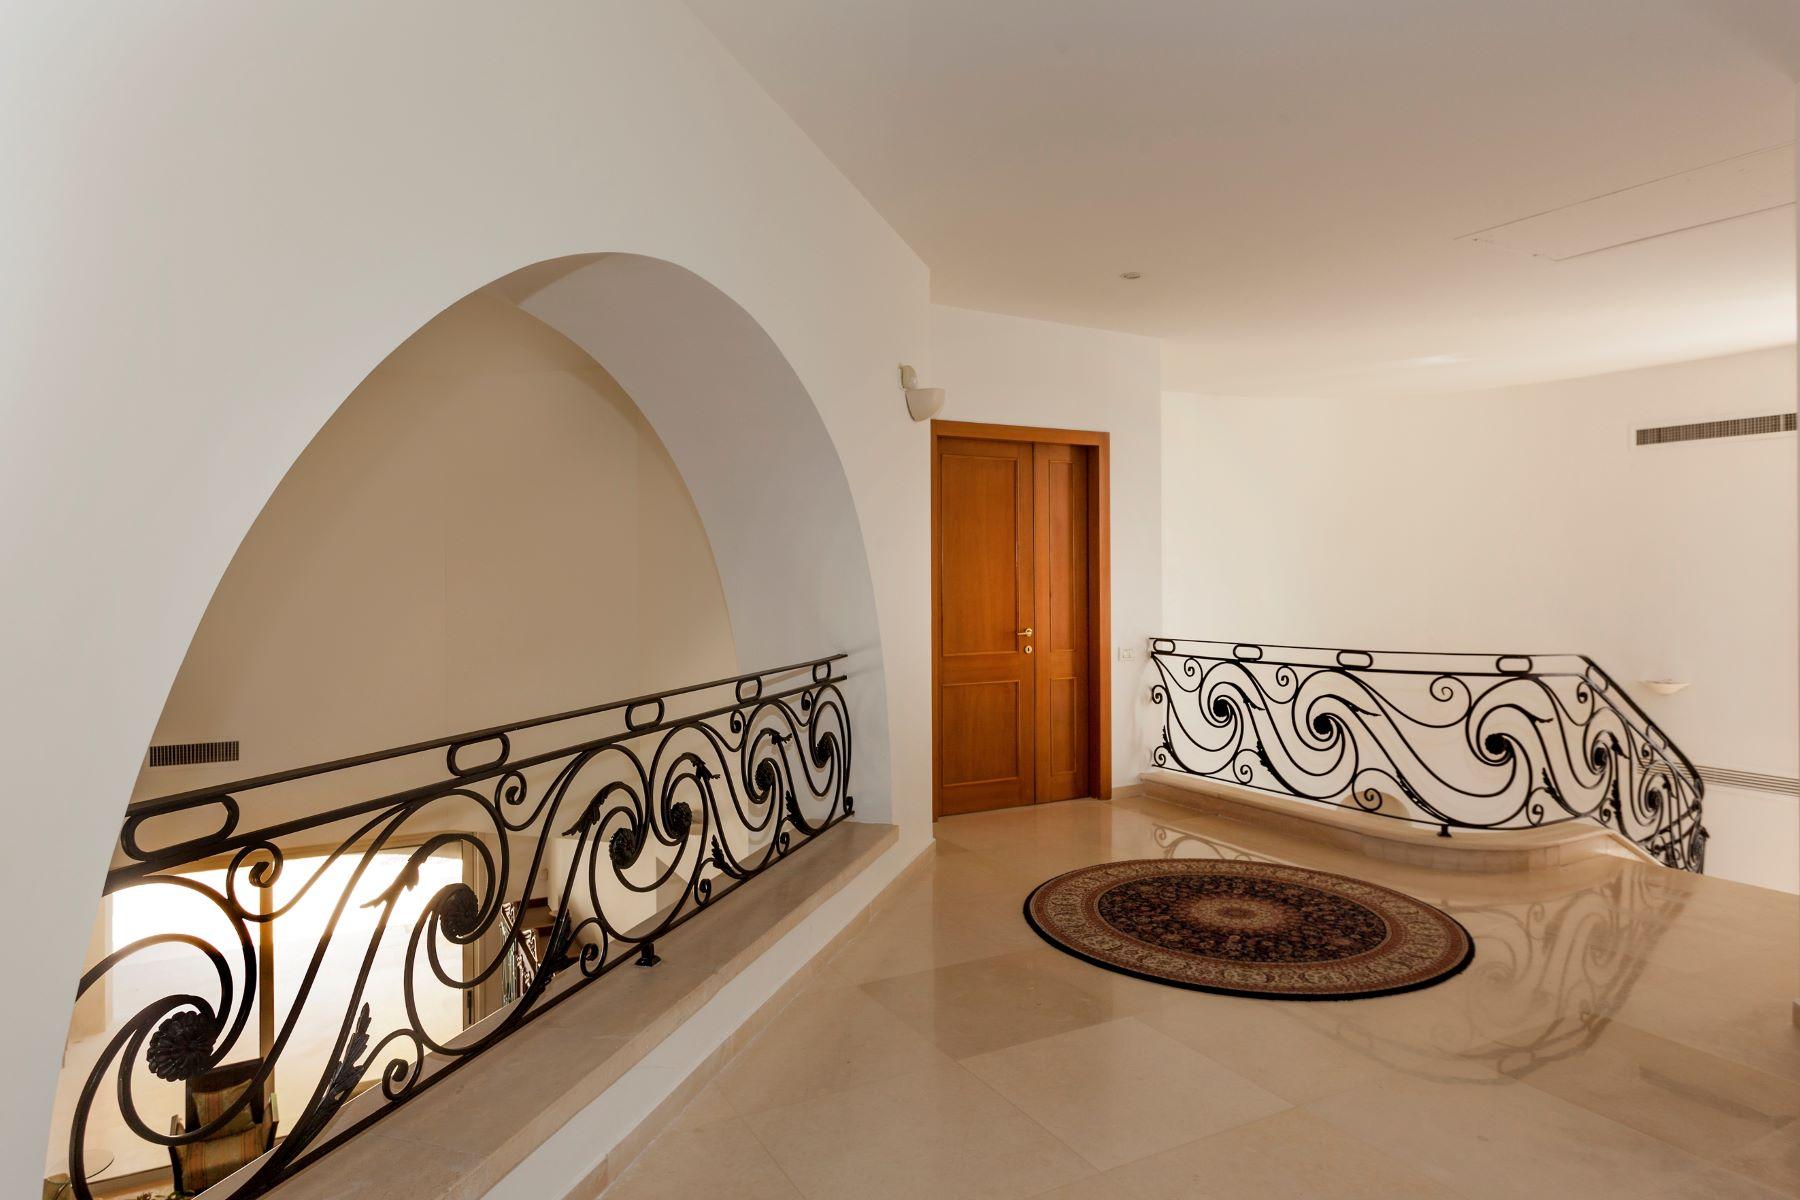 Additional photo for property listing at Palatial Mansion in Kfar Shmaryahu Kfar Shmaryahu, Israel Israel